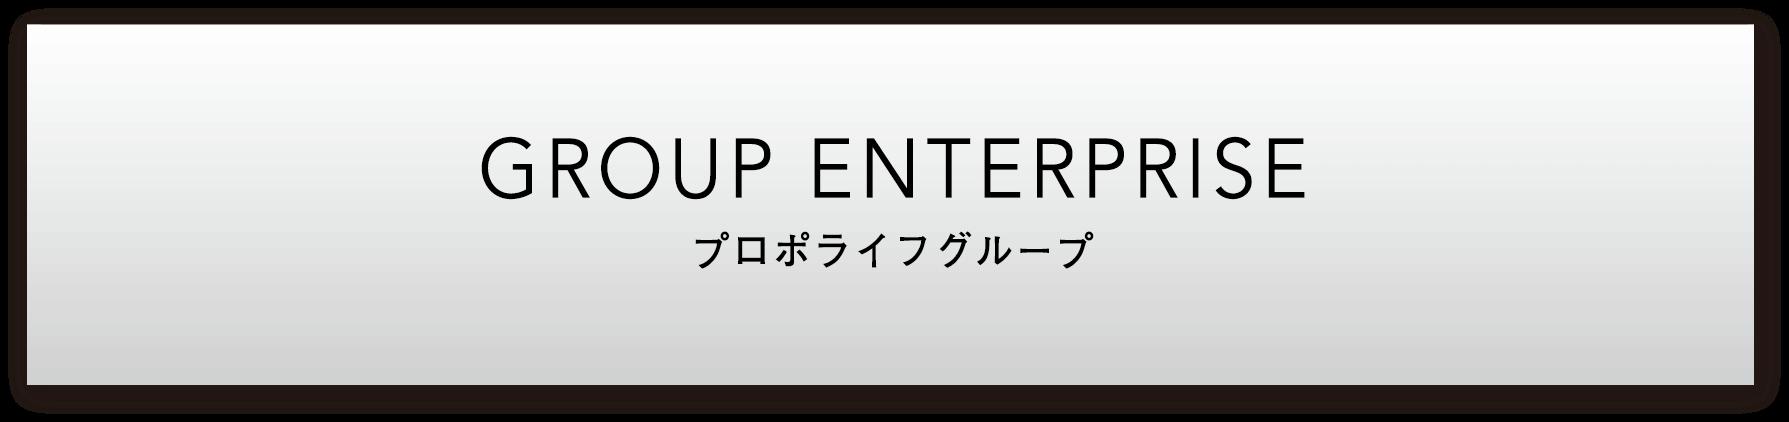 GROUP WNTERPRISE プロポライフグループ